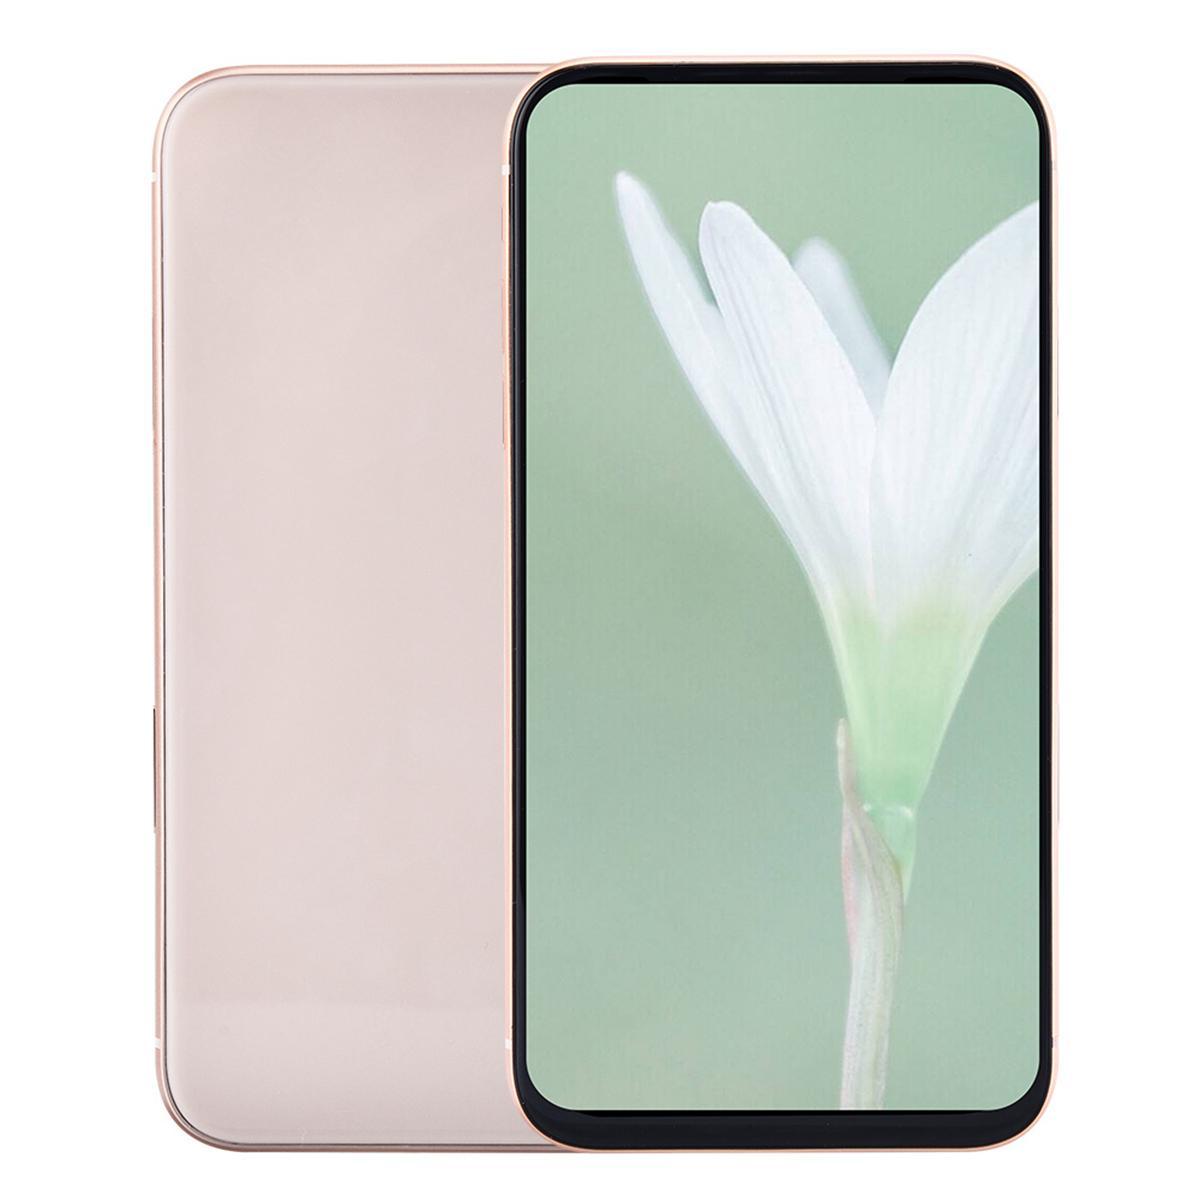 3 Kameras I12 PRO 5G V4 Smartphone 2 GB 16 GB 6,1 Zoll Alle Bildschirm HD + Quad-Kern 3G WCDMA Android OS Dual Nano SIM-Karte Gesichts-GPS-Smartphone 128GB 256GB 512GB freie UPS TNT blau